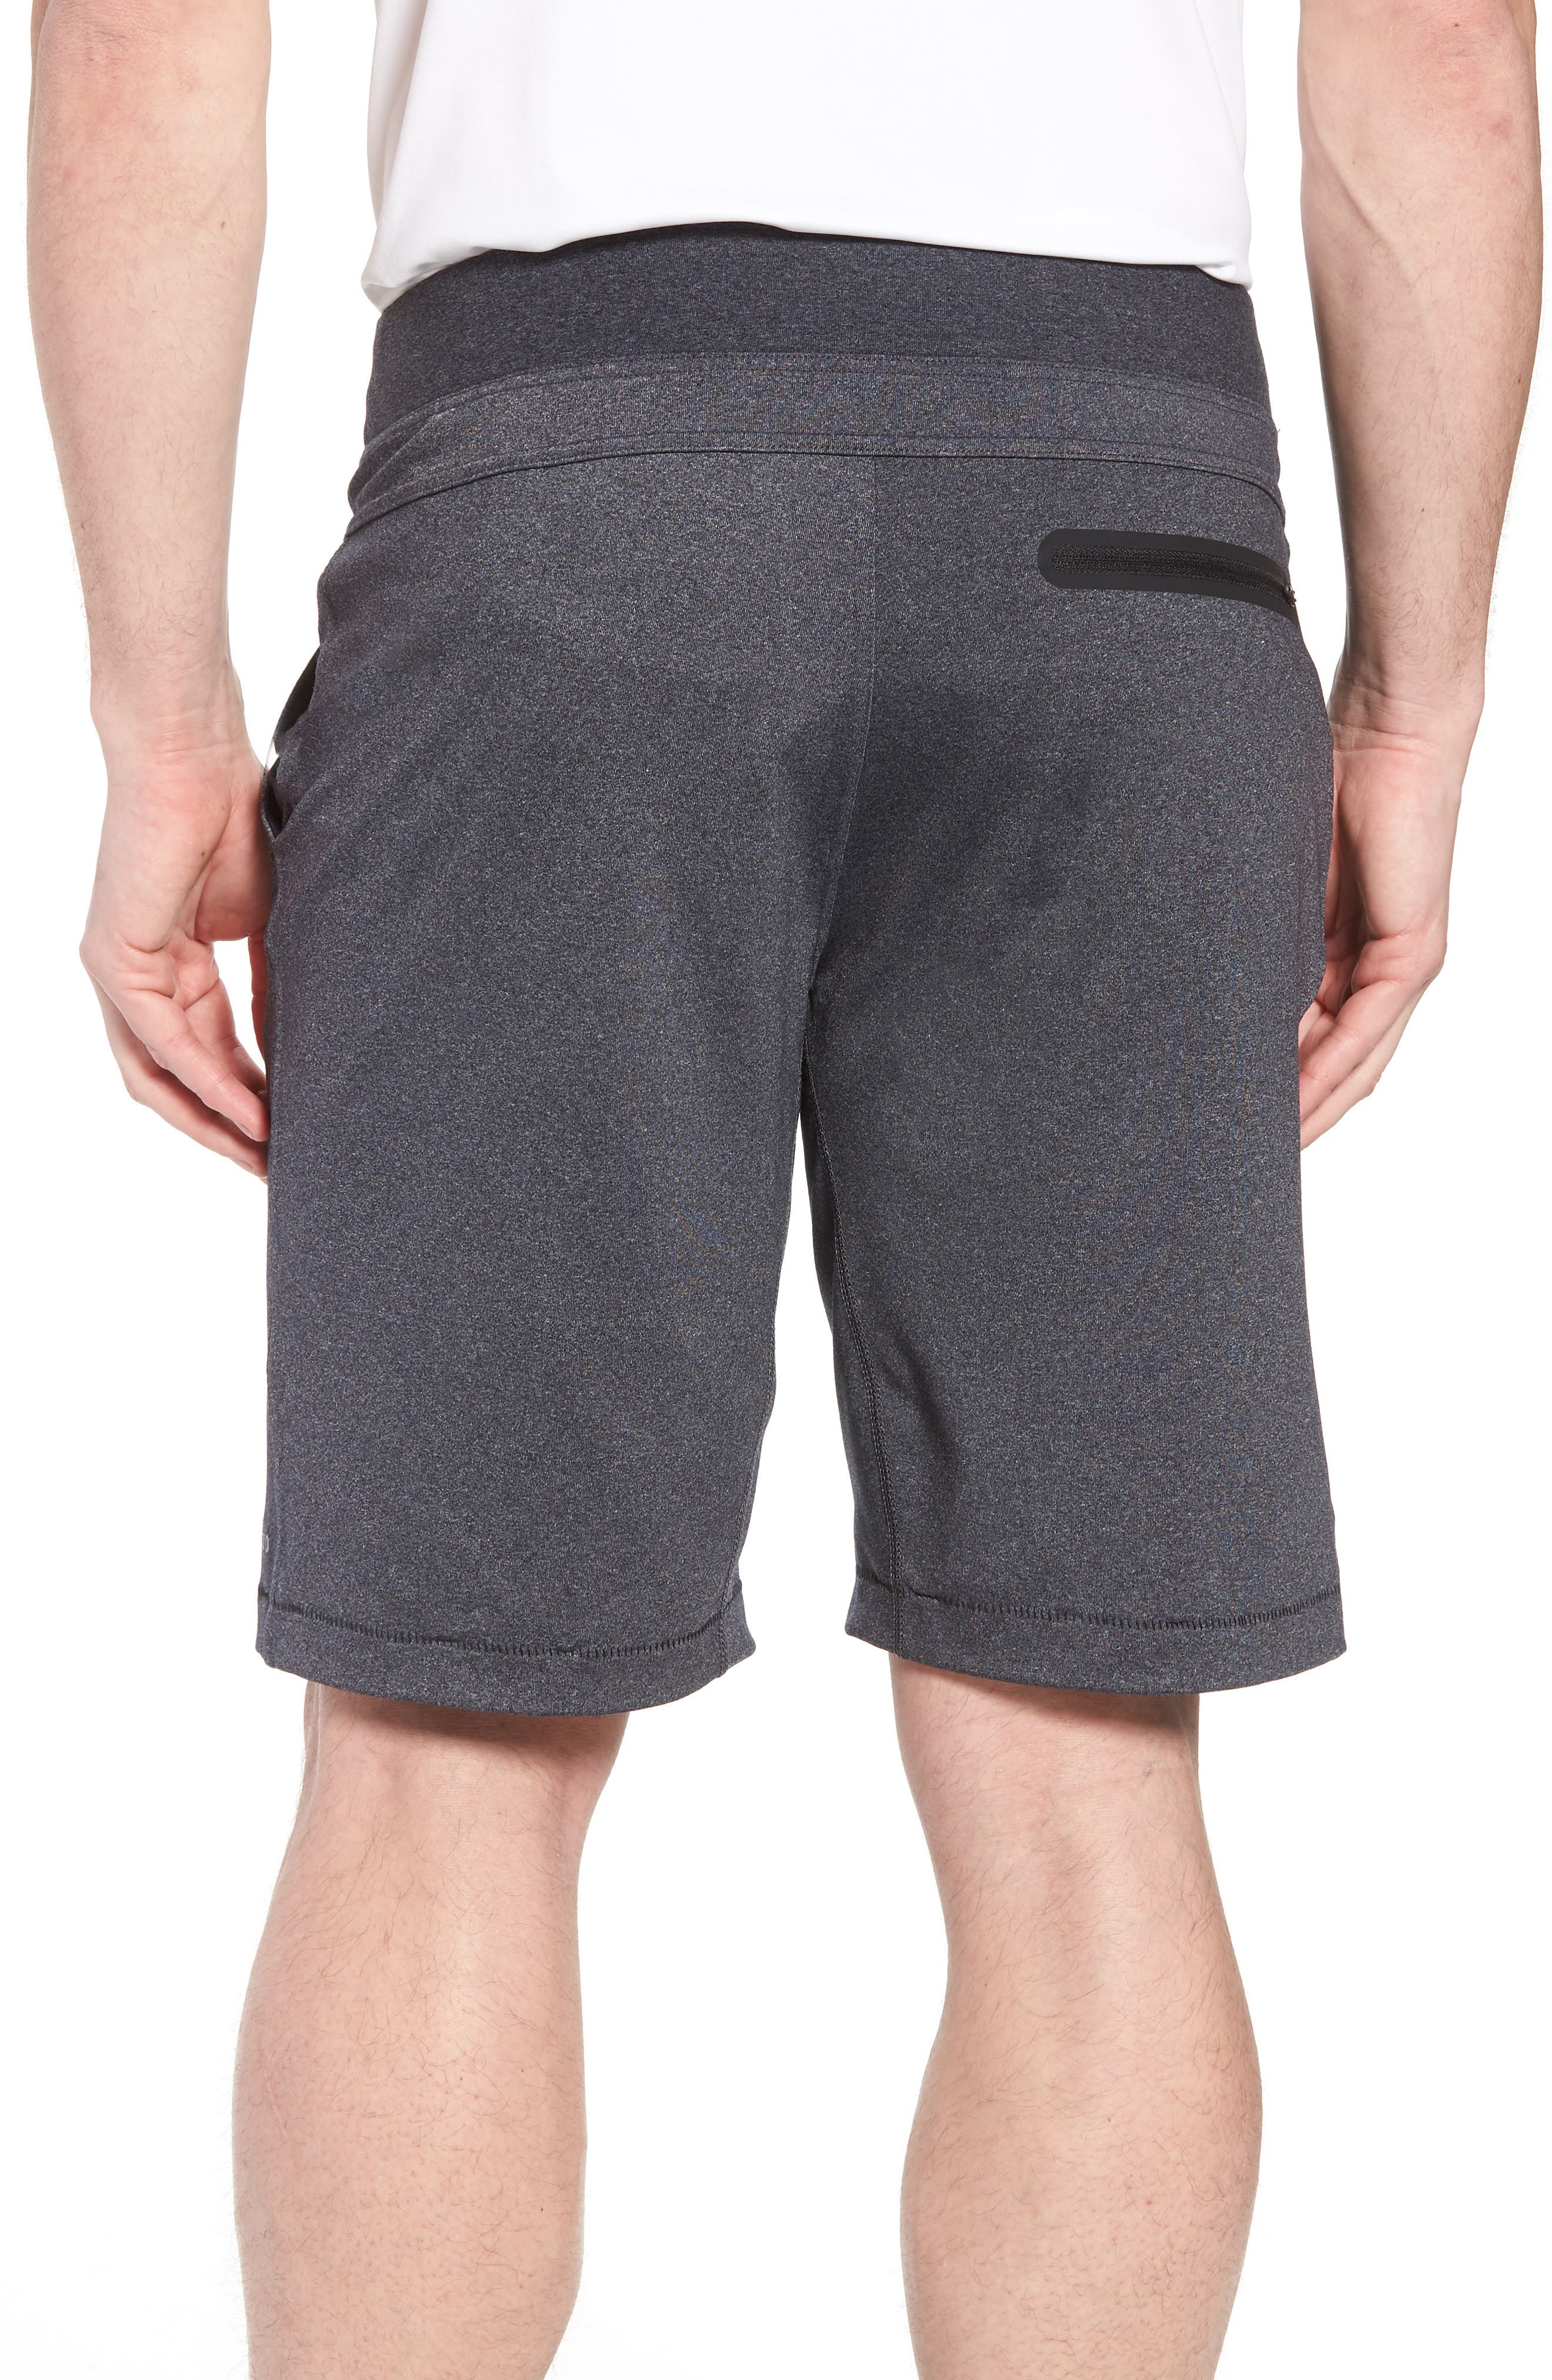 206 Shorts,                             Alternate thumbnail 2, color,                             Charcoal